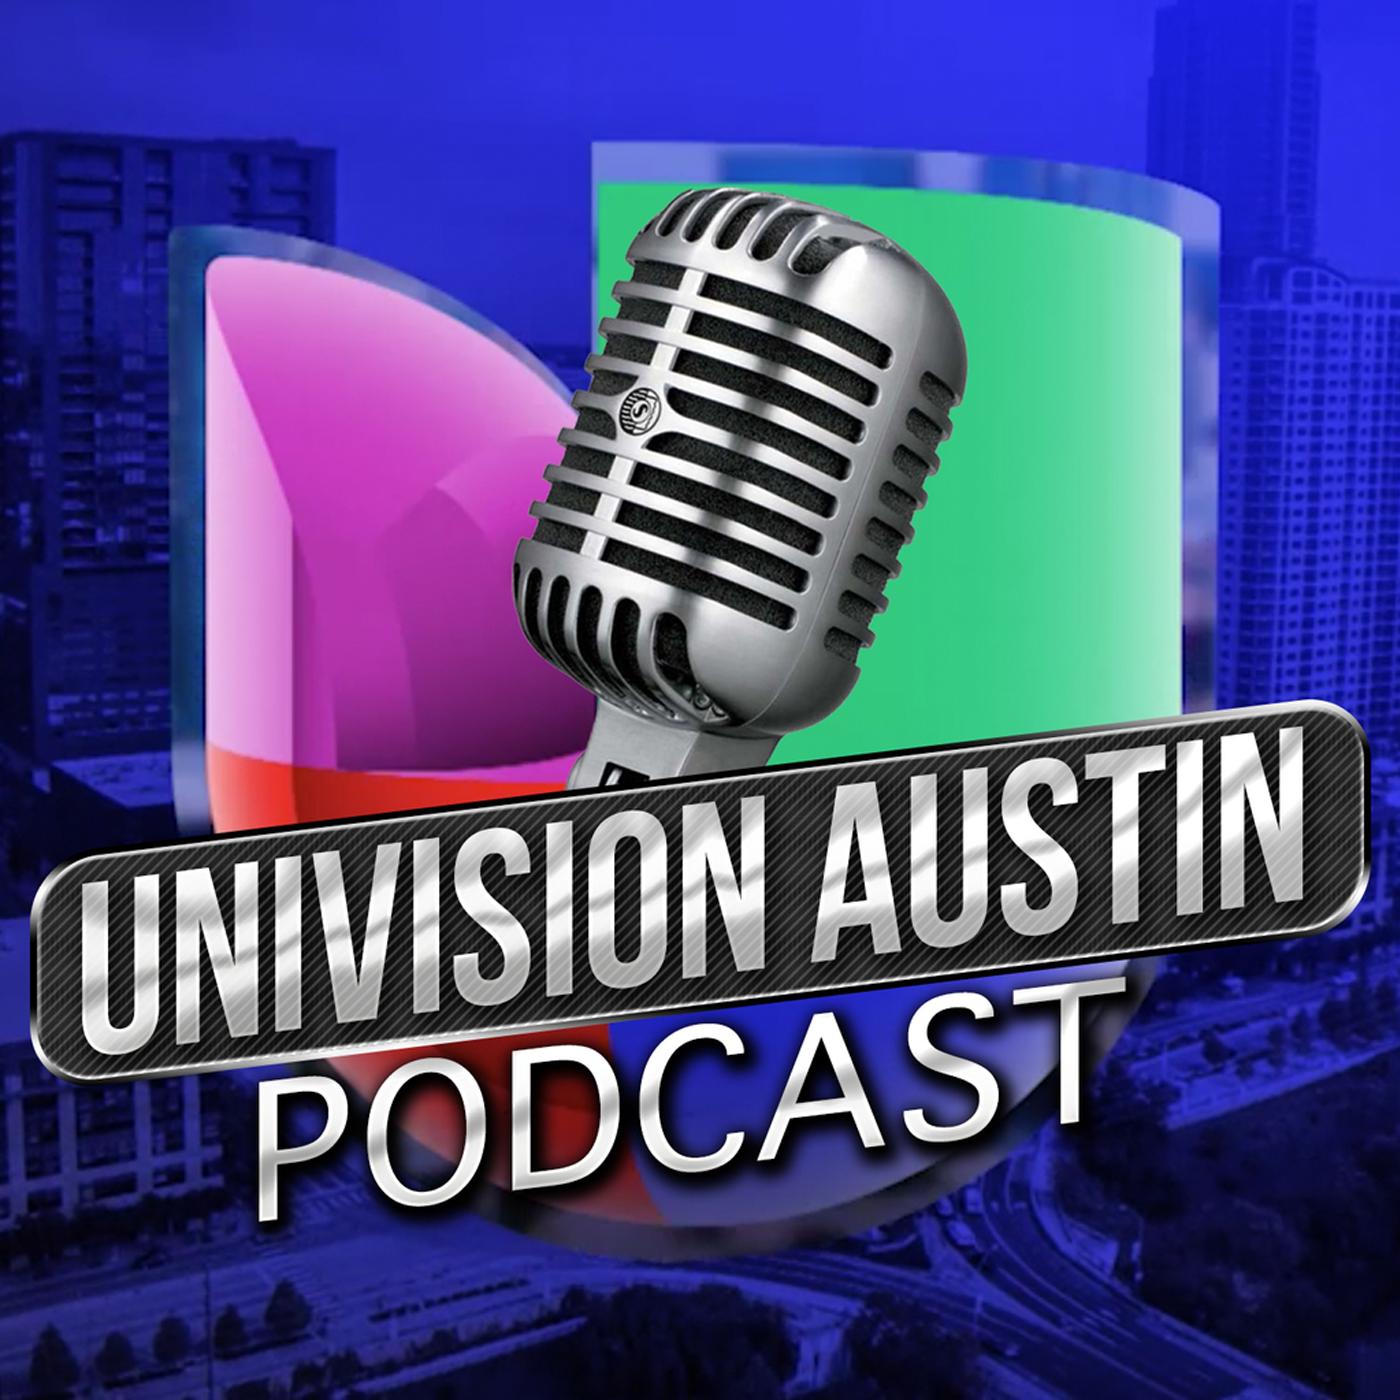 Univision Austin Podcast